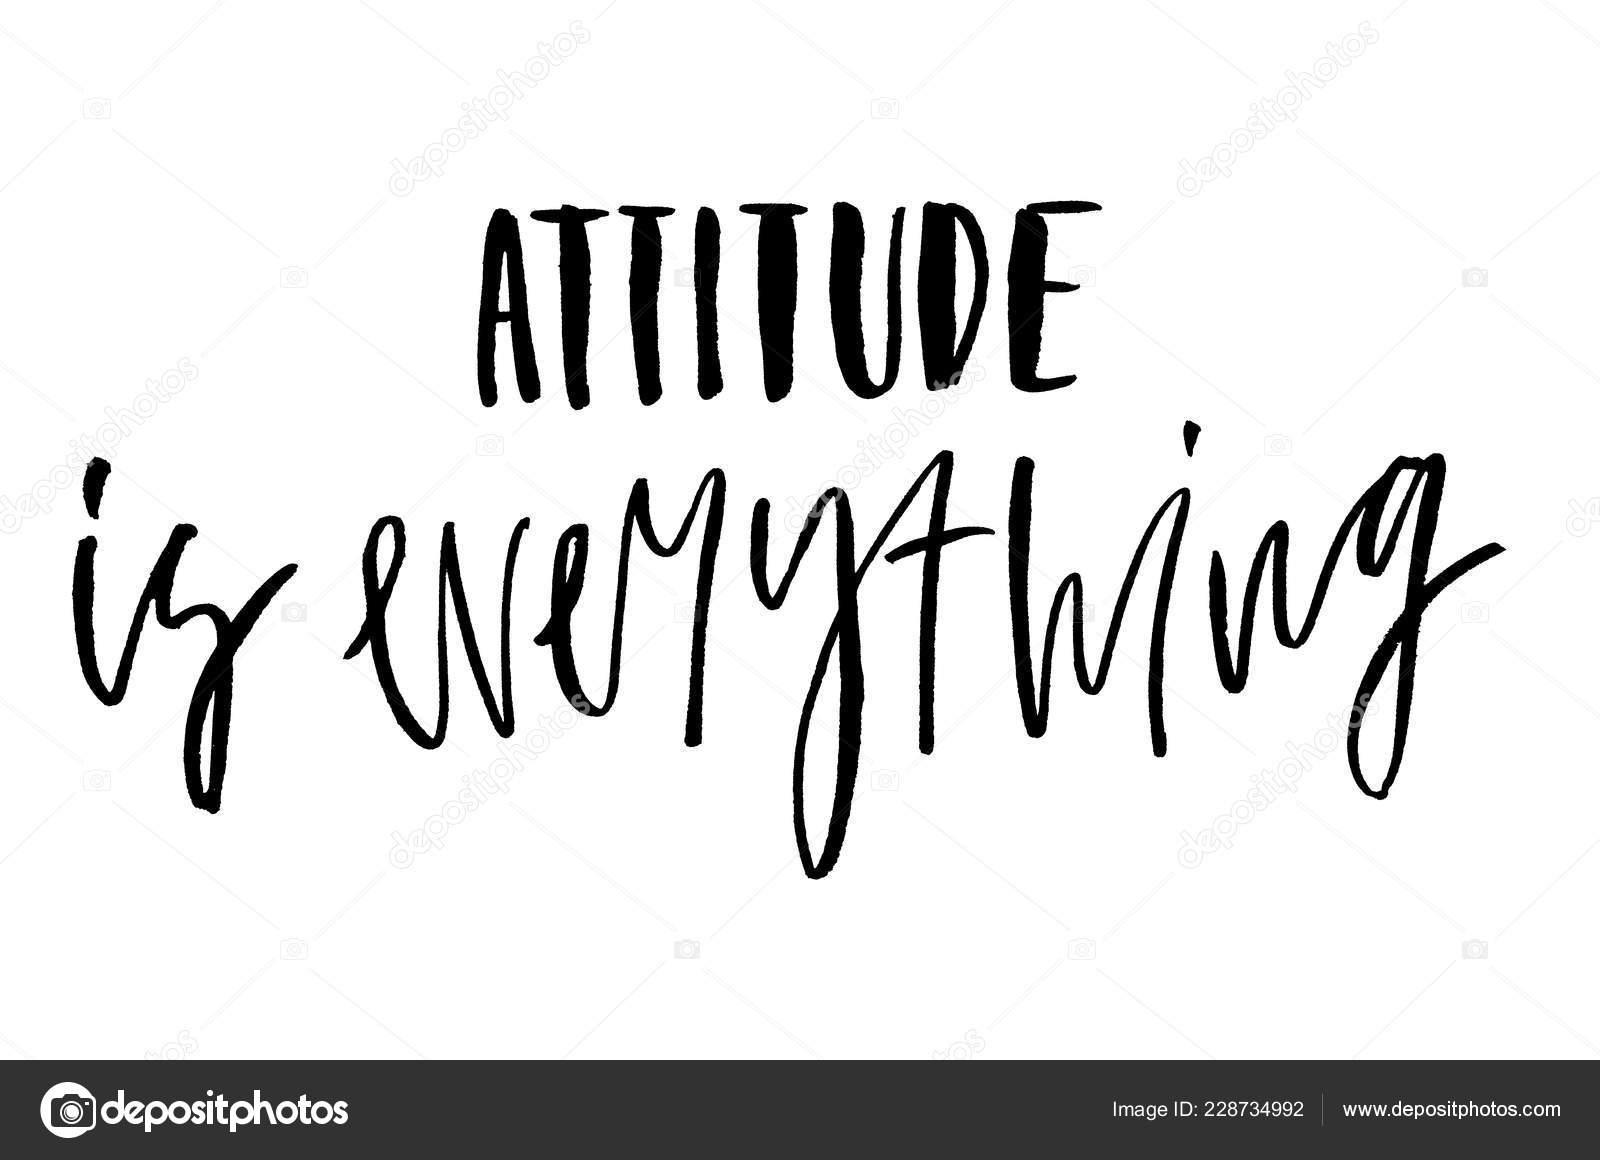 Attitude Everything Handwritten Text Modern Calligraphy